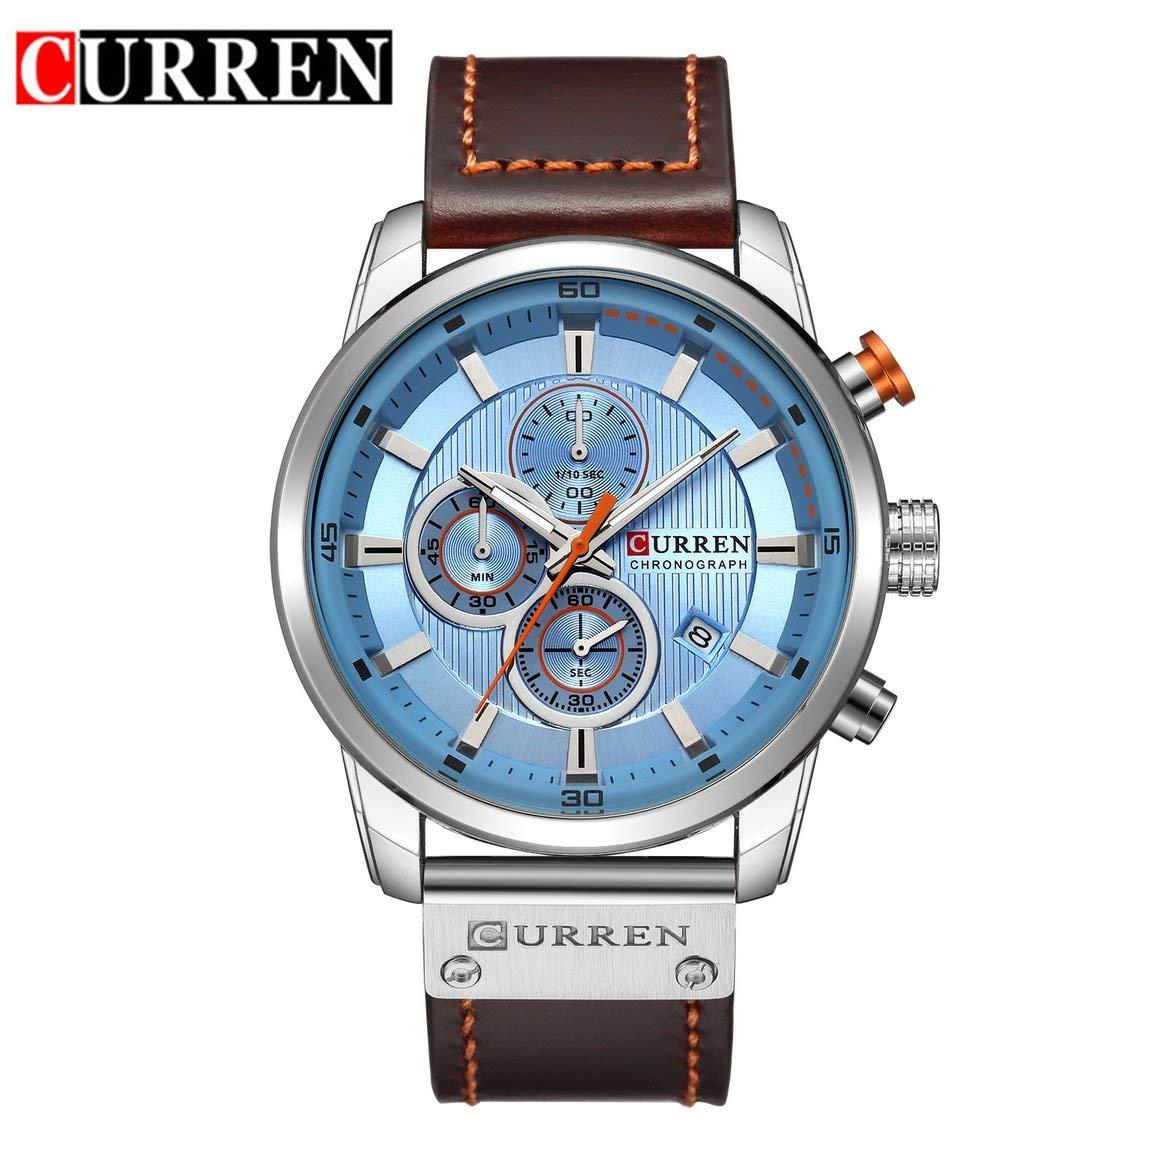 Kongqiabonaカレン8291高級男性レザーバンドストラップ腕時計ハイクラス男性男性機械的なレロジオmasculino時計ギフト B07L3BXJ5N 白 ブルーダイヤル